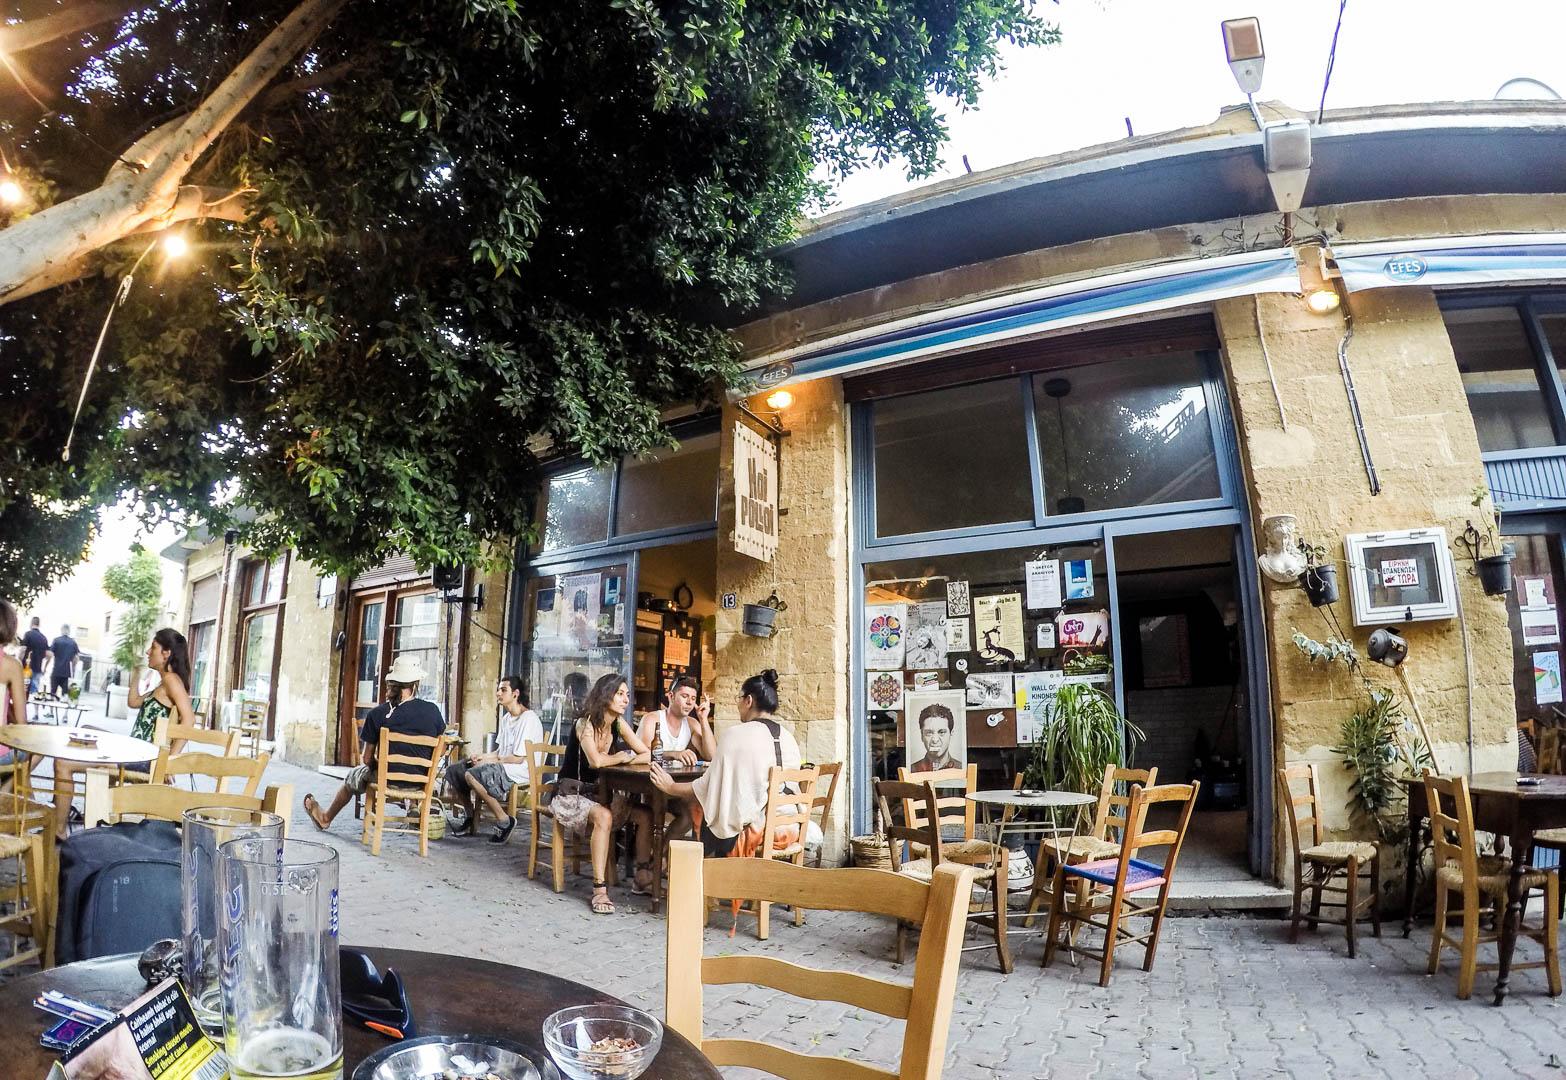 Northern Cyprus Kuzey Kıbrıs